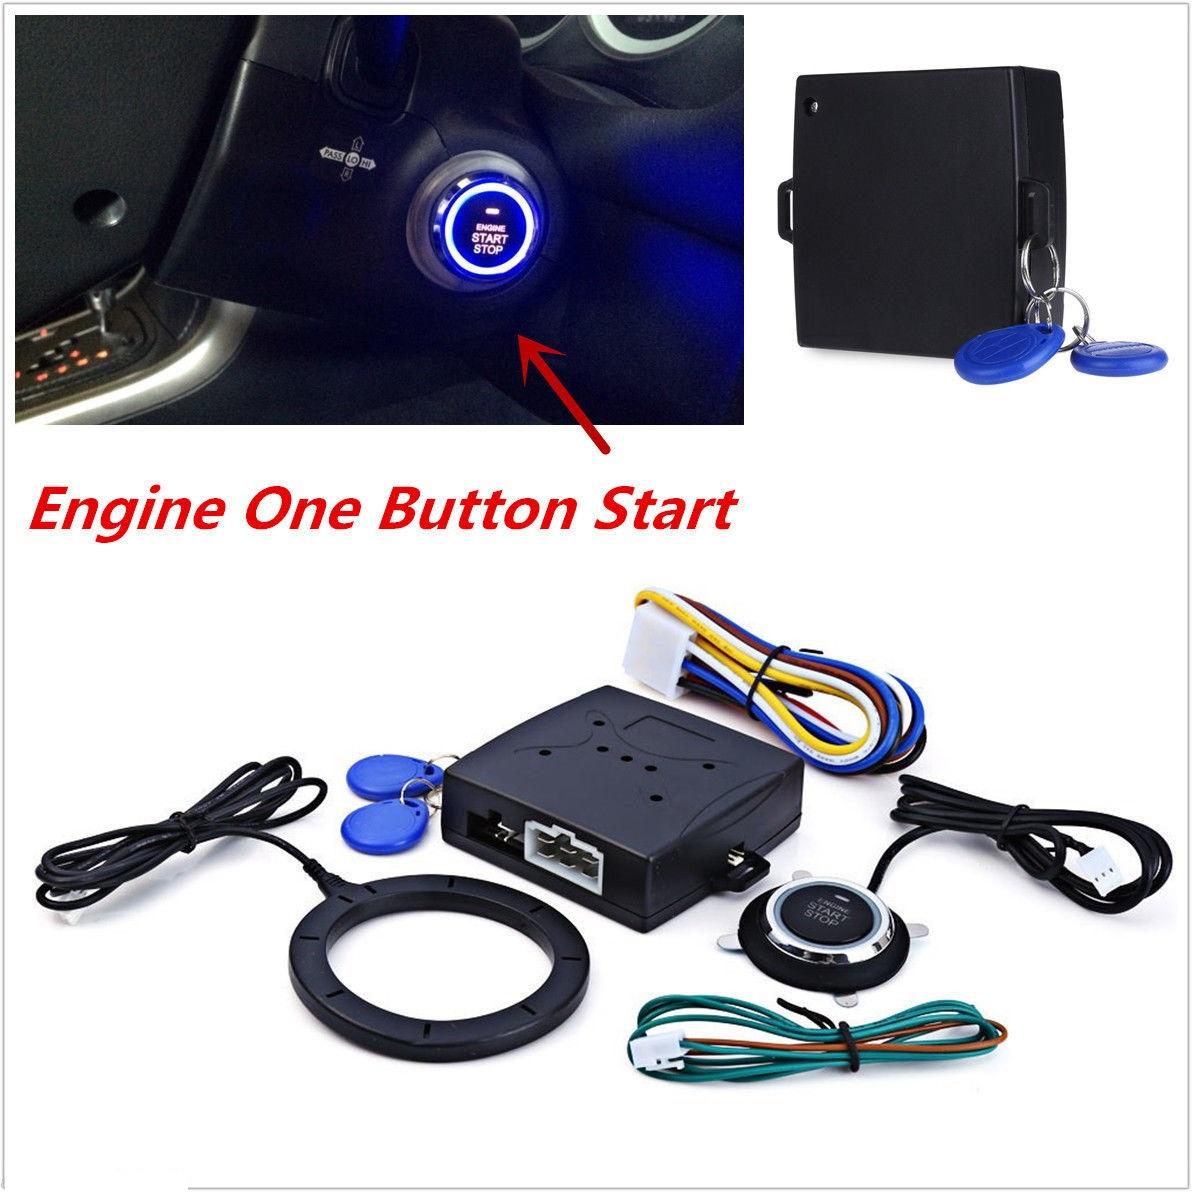 12v Car Alarm System Keyless Entry Push Button Start: Car Engine Push Start Button/RFID Engine Lock Ignition